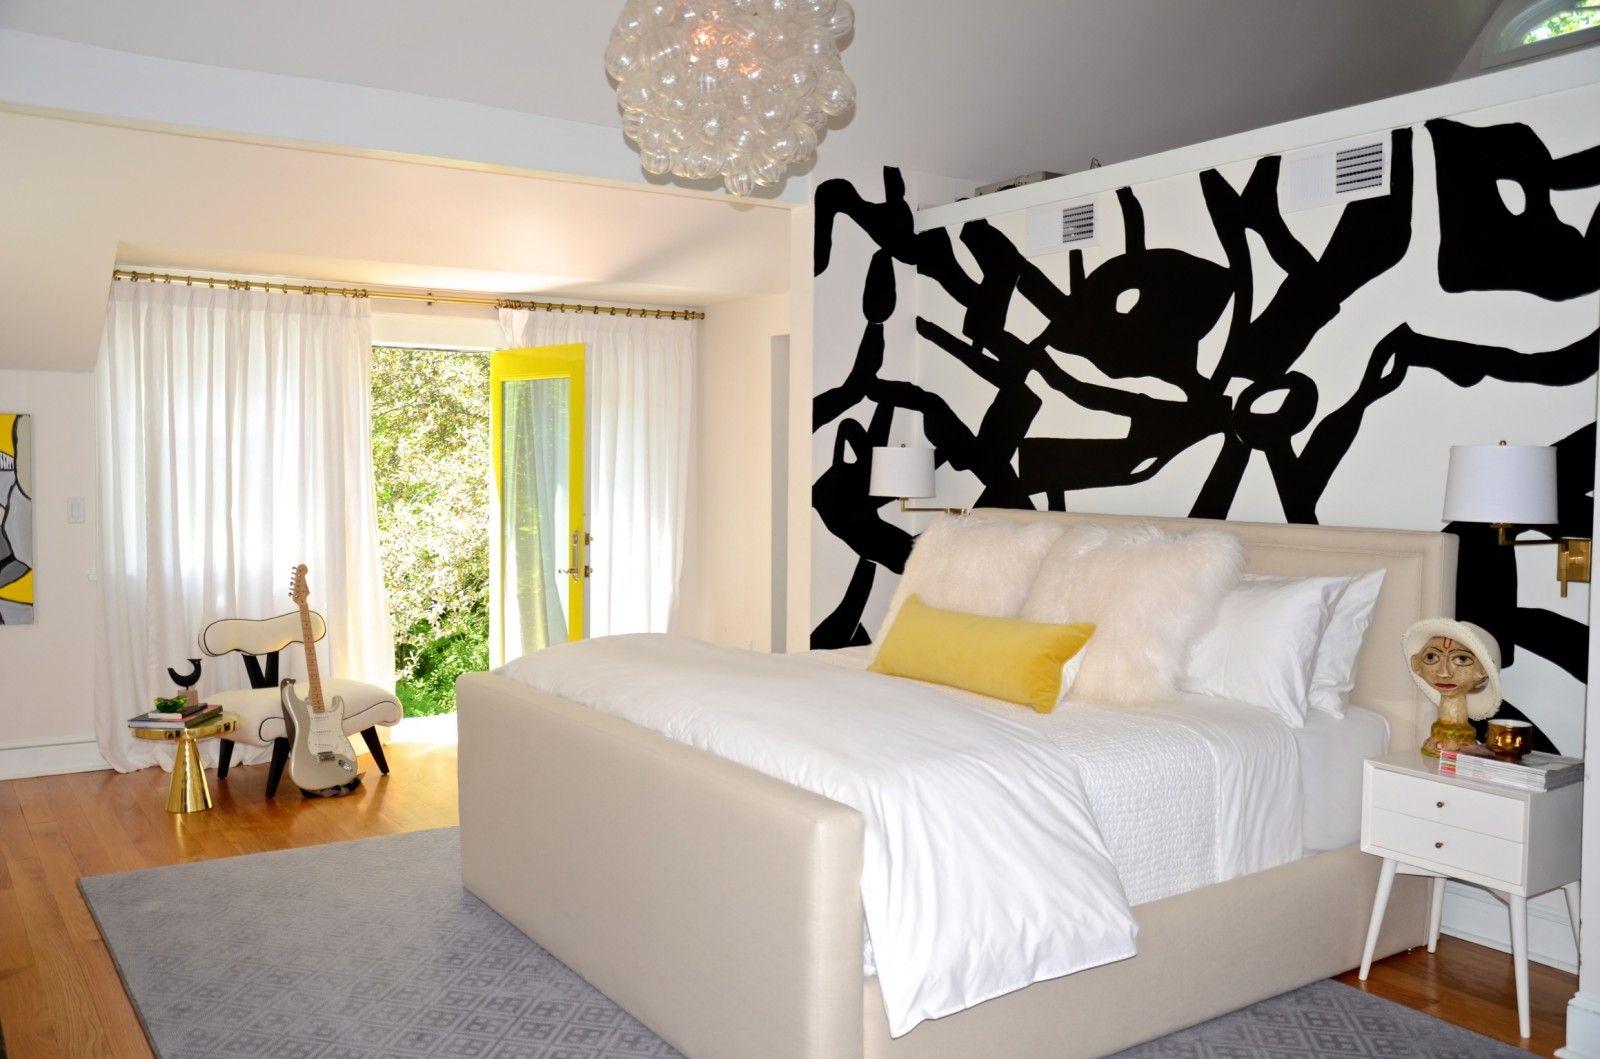 Bedroom by Denise Davies + Kerri Rosenthal on http://roomreveal.com